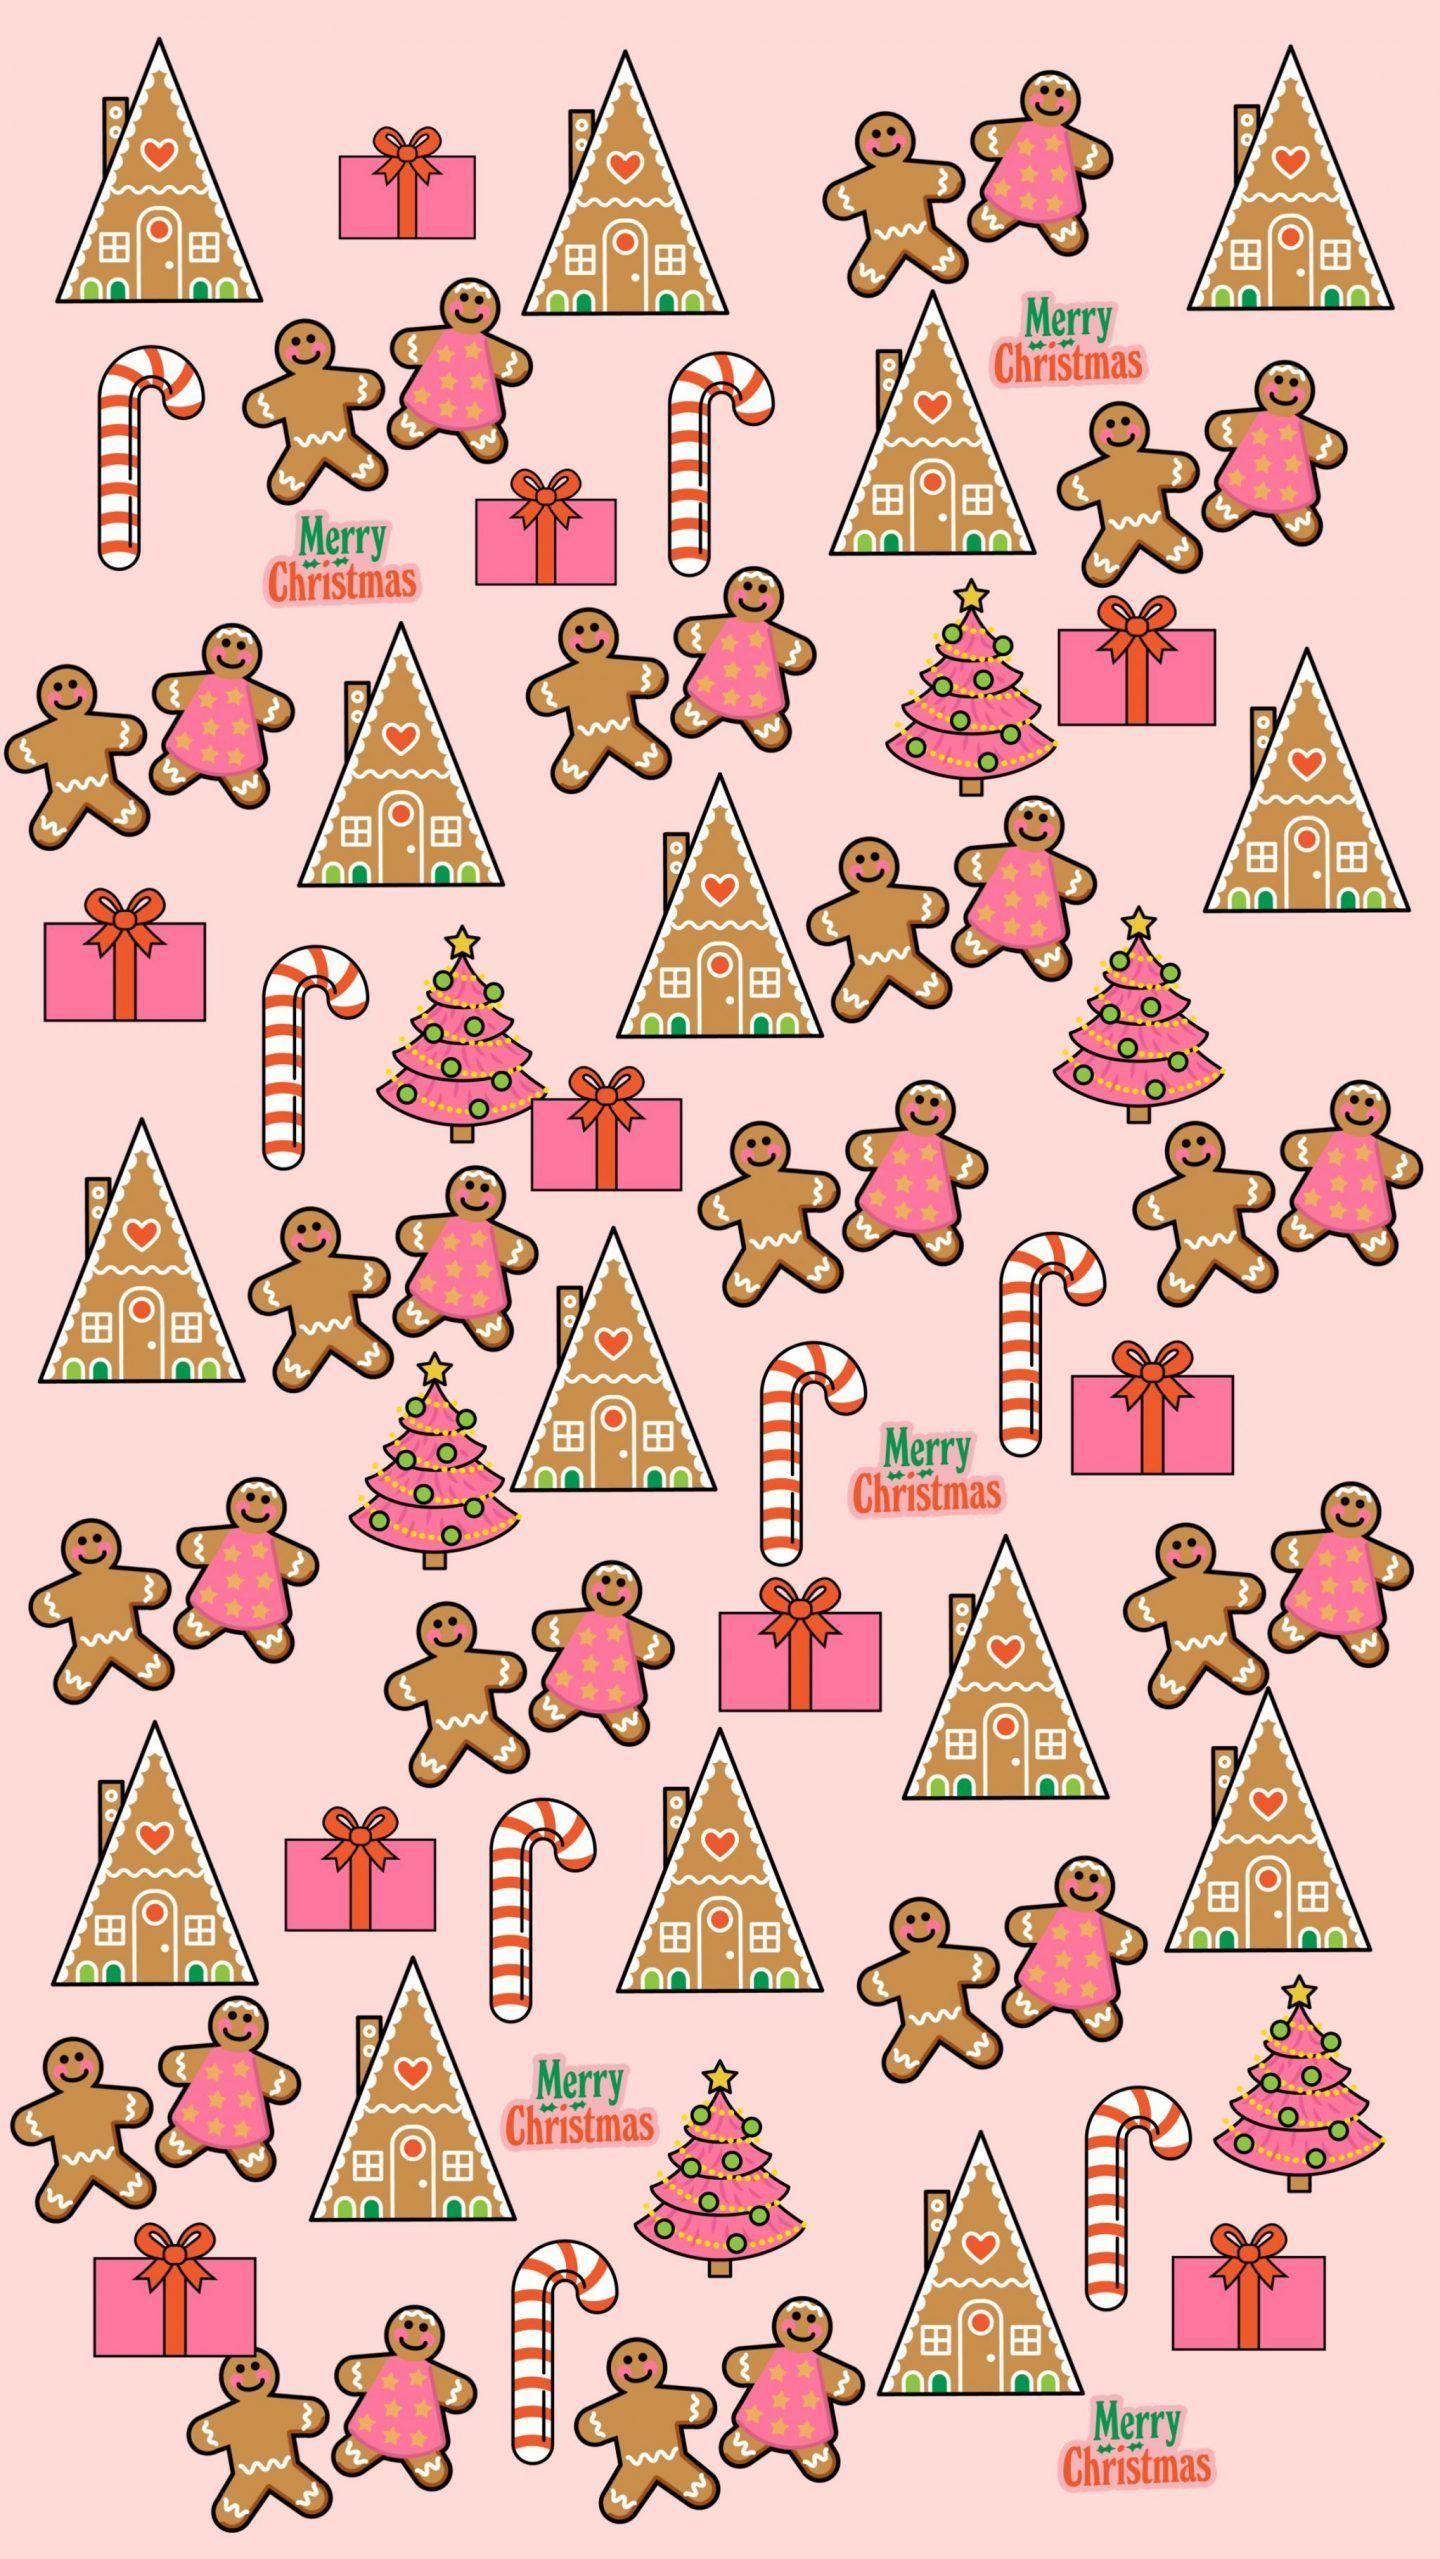 Free Christmas Phone Wallpapers - Dizzybrunette